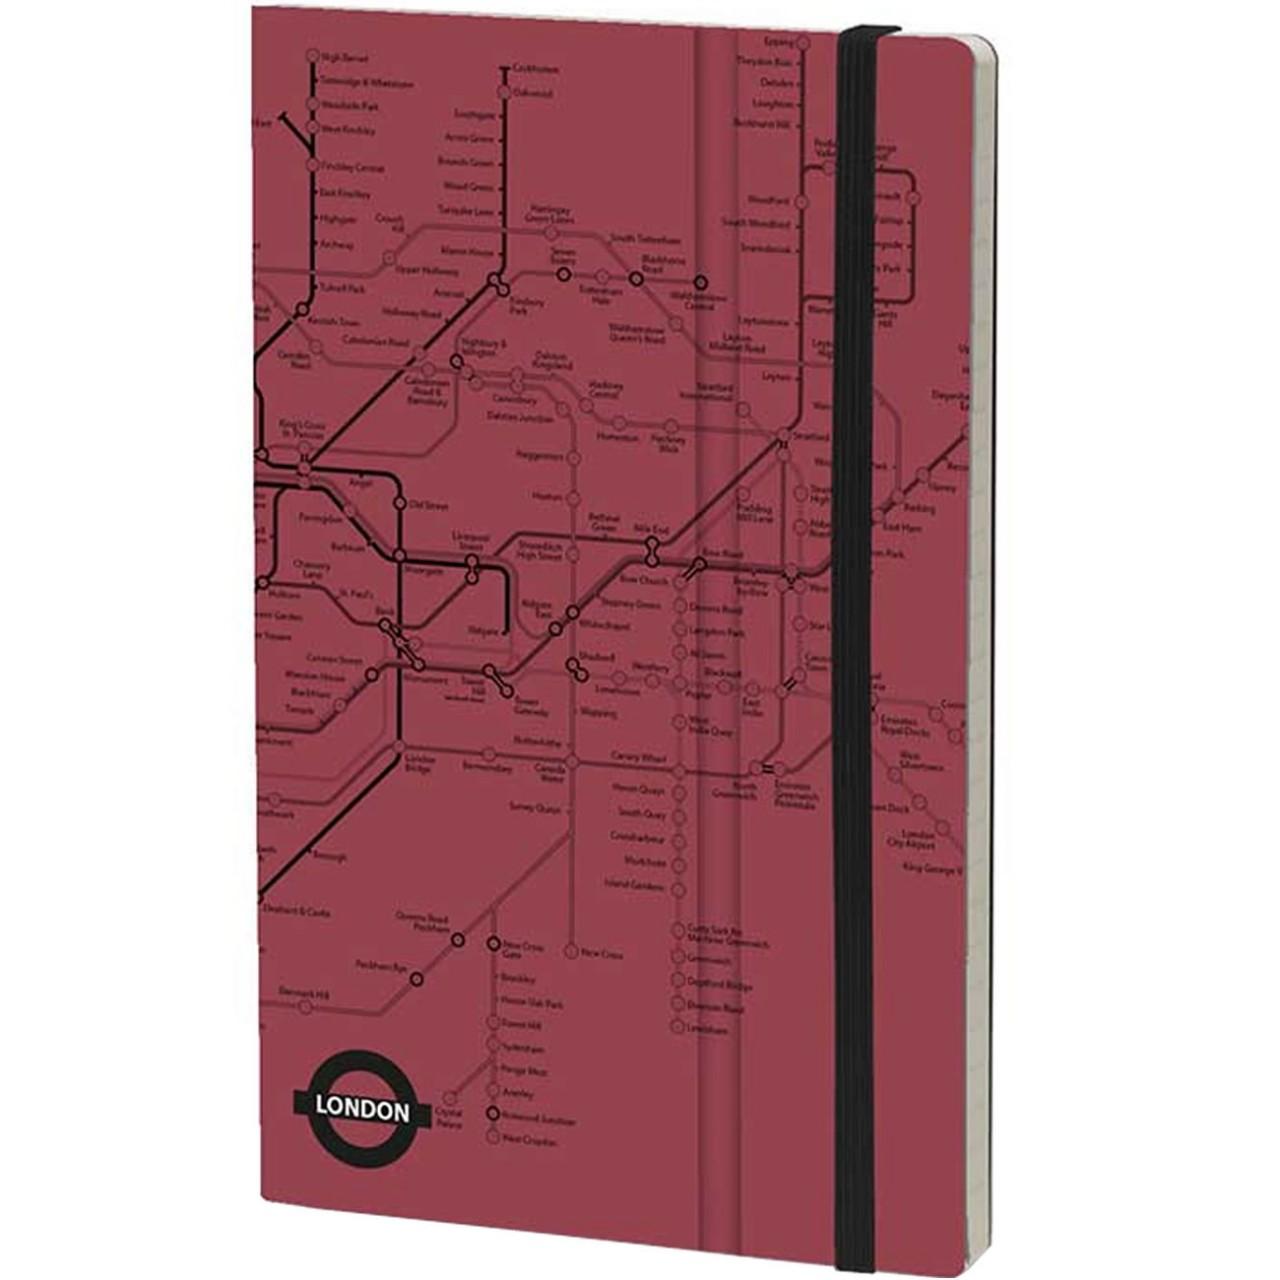 Stifflexible Notizbuch UNDERGROUND 13 x 21 cm 192 S., RED (Londres)